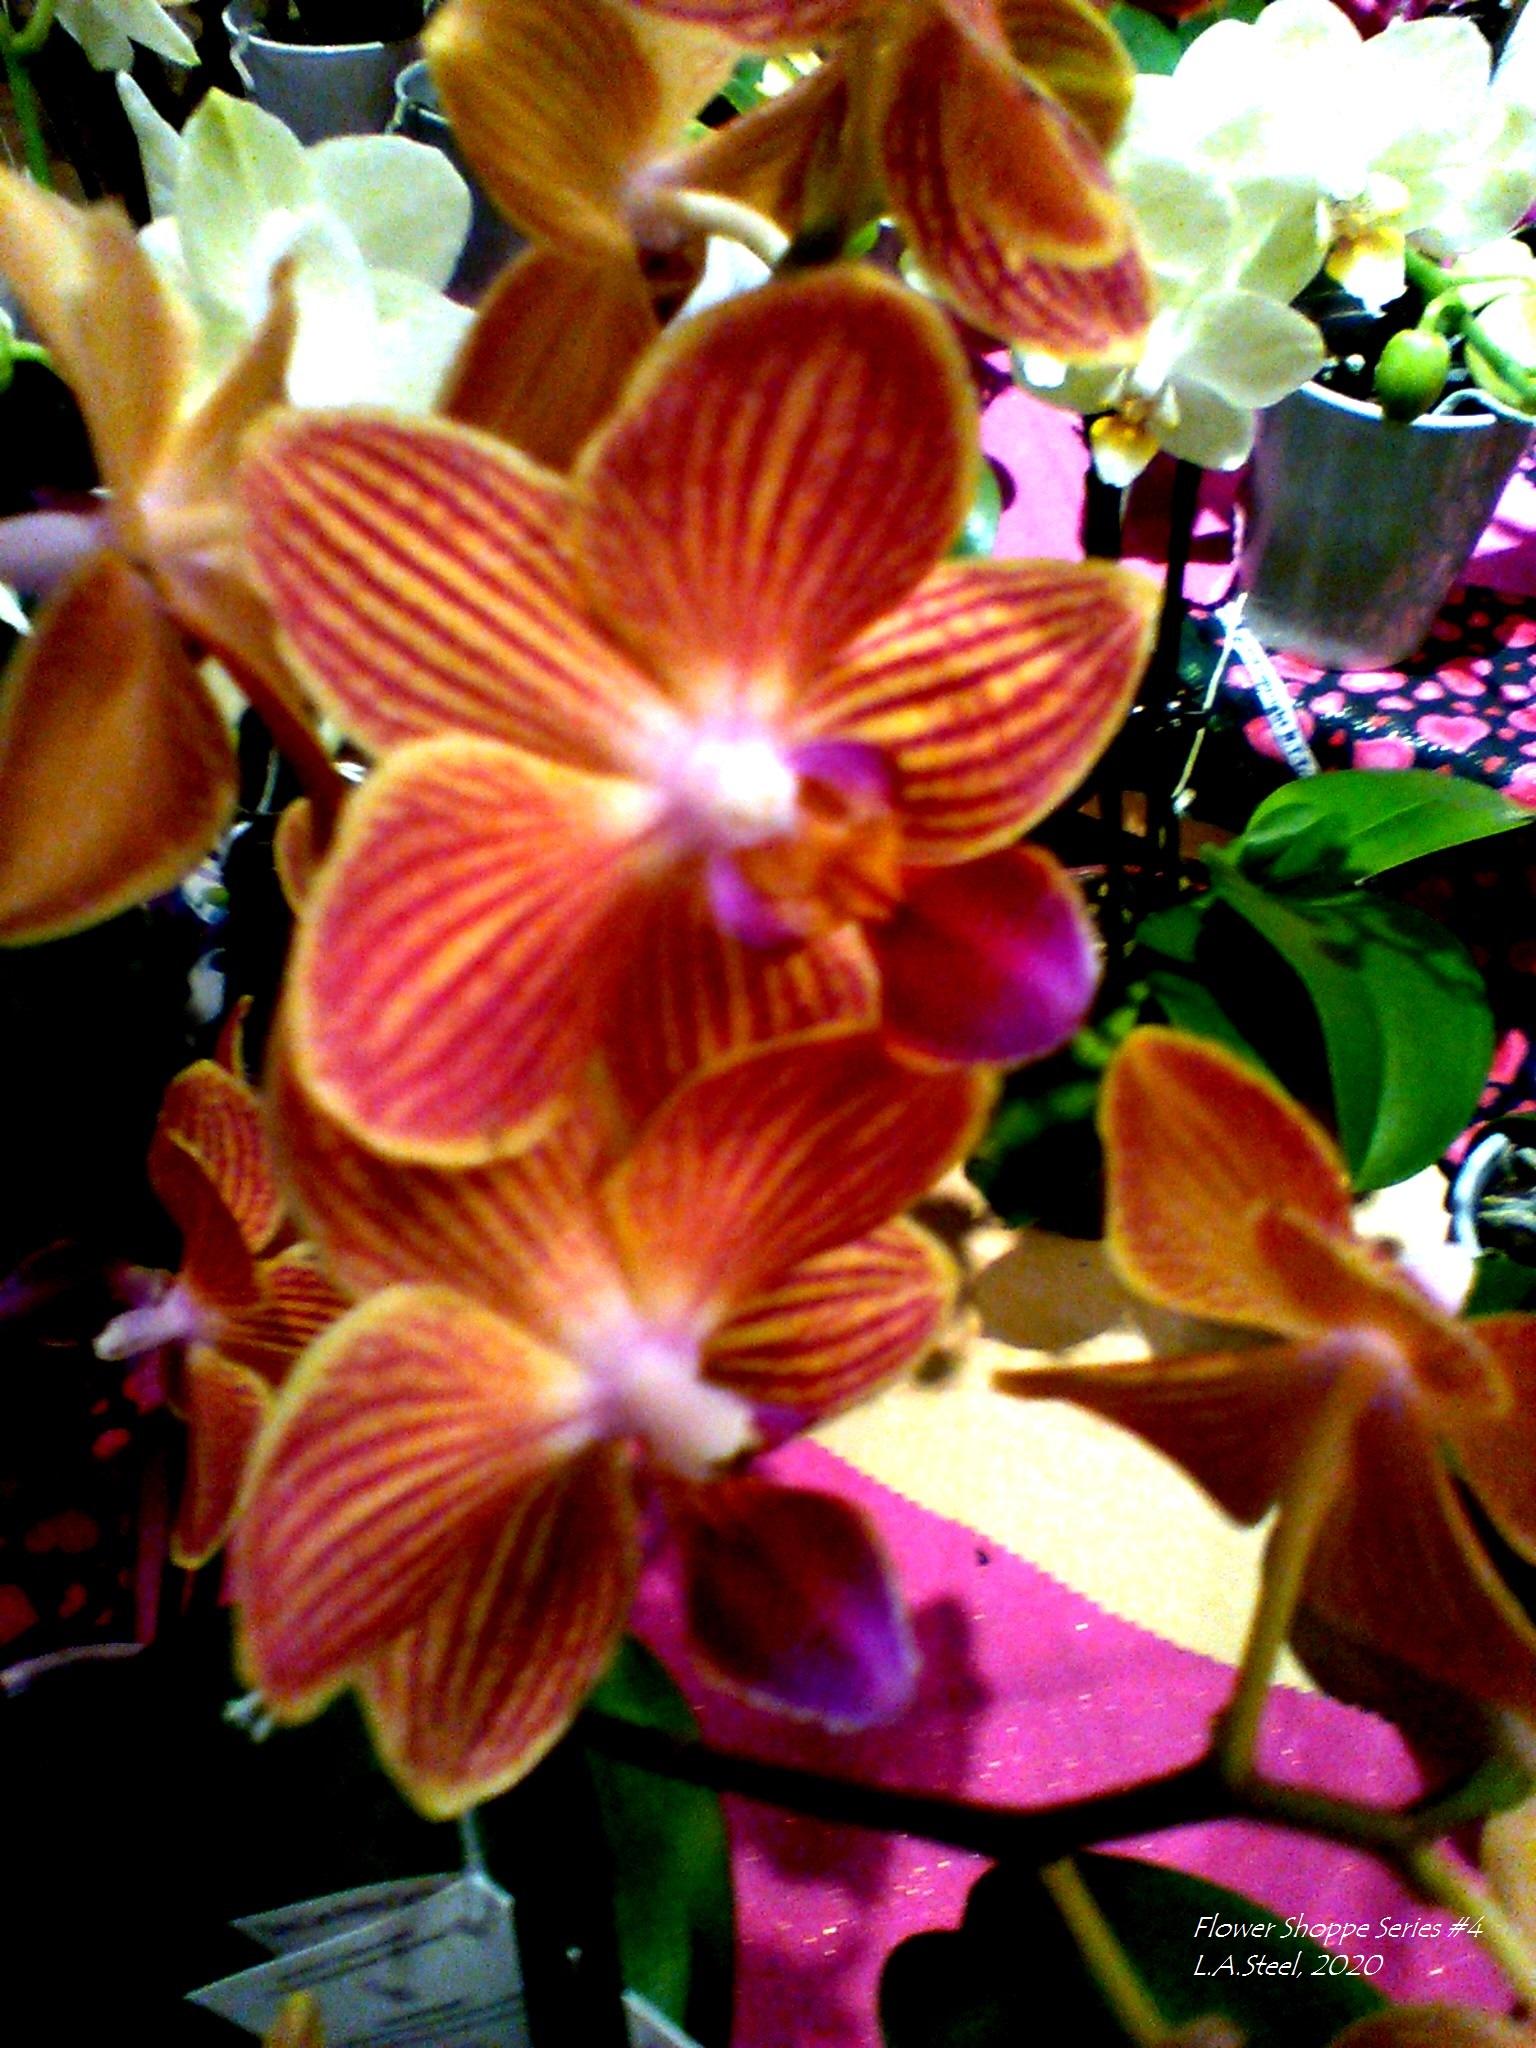 flower shoppe series 4 #8 2020